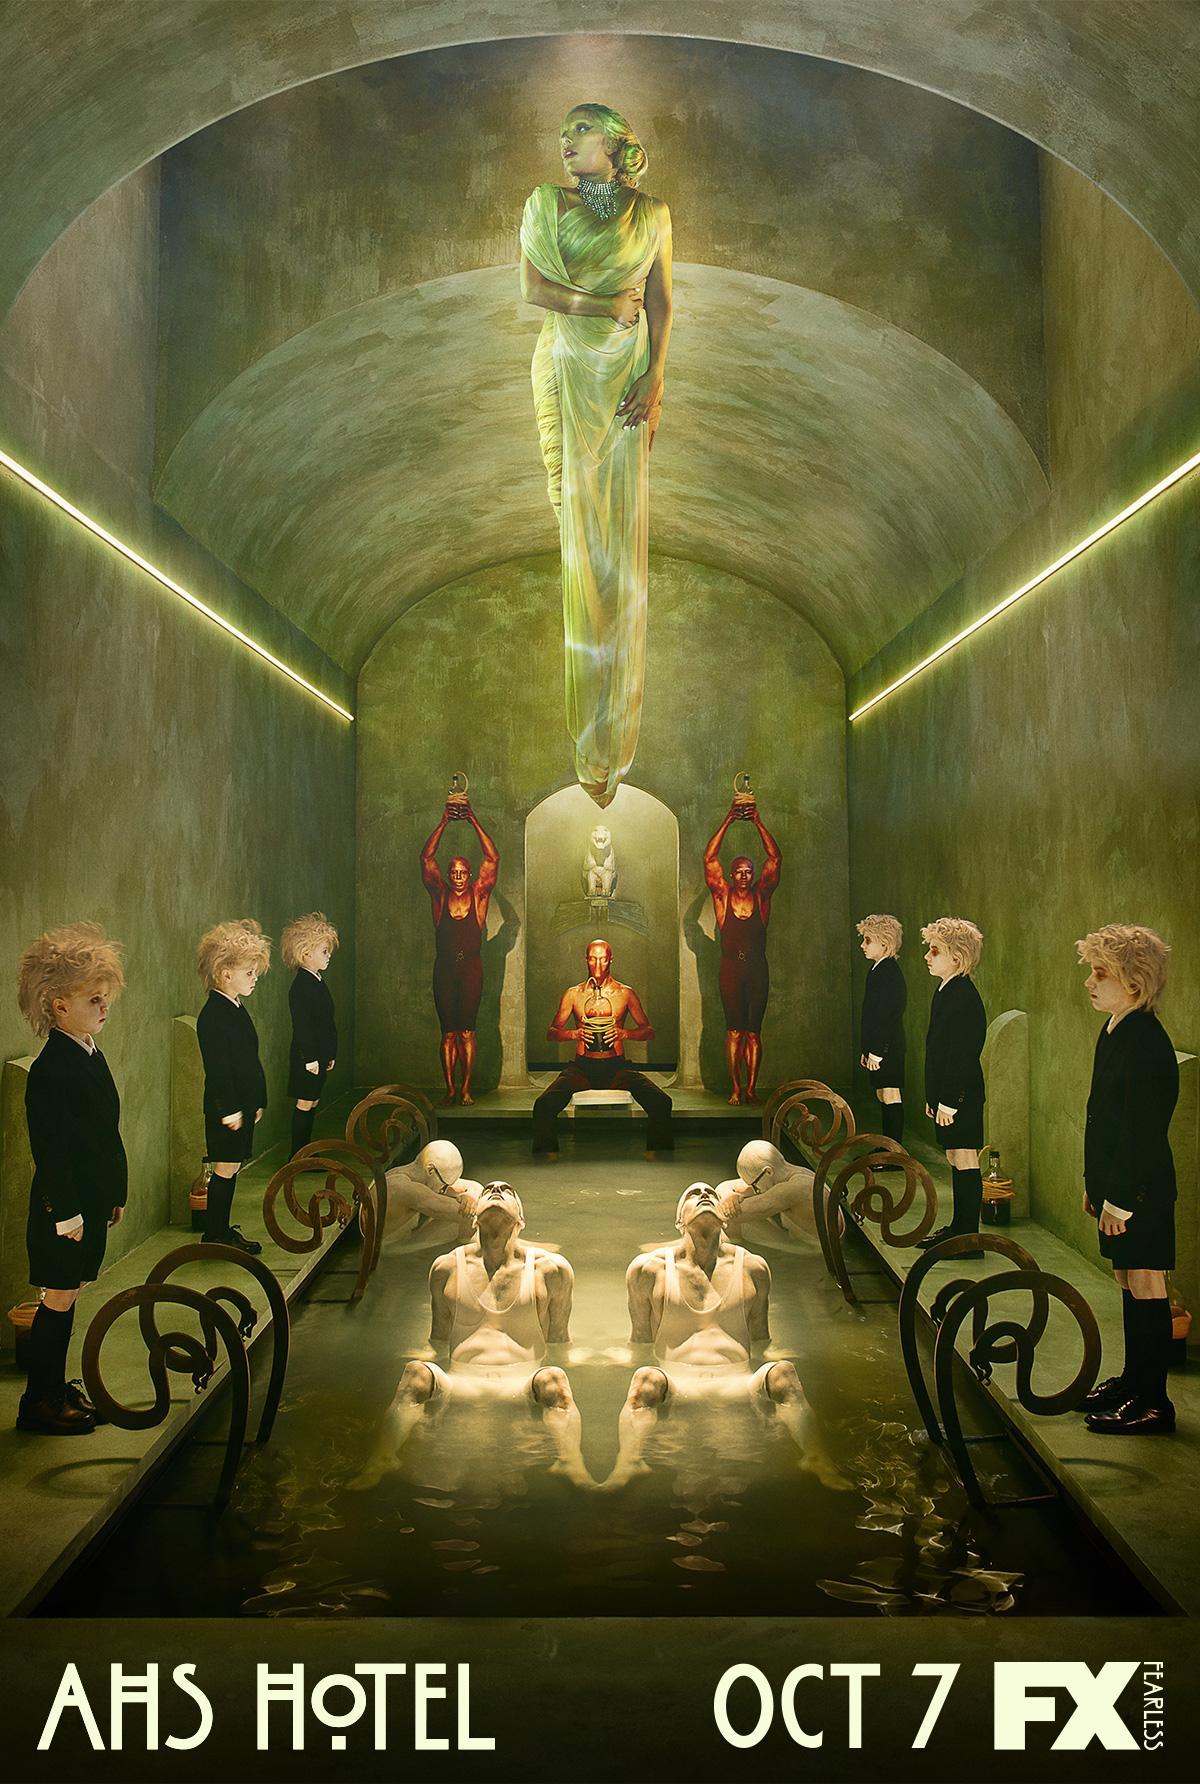 Image Ahs Poster Gaga Cortez Jpg American Horror Story